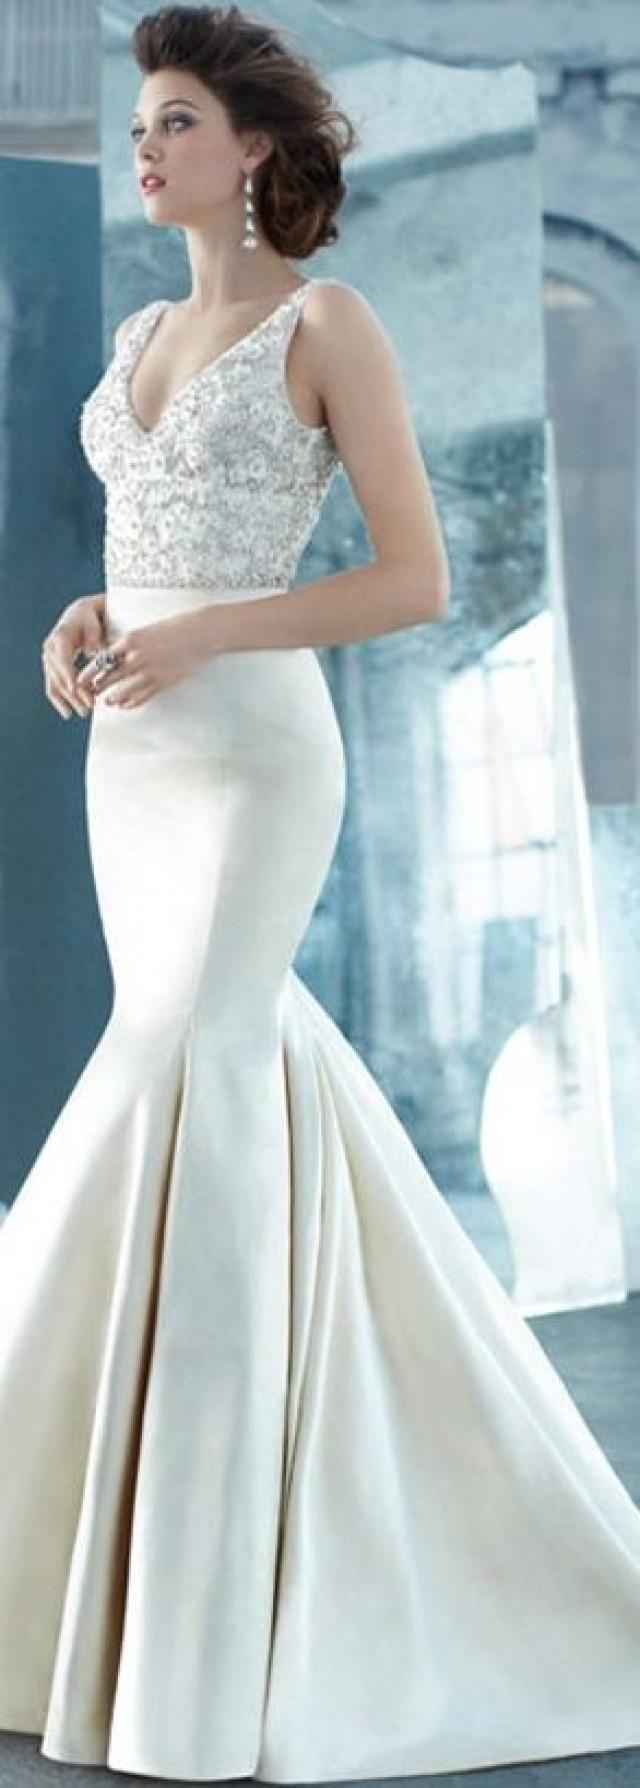 Lazaro | WEDDING DRESSES !!! | Pinterest | Wedding dress and Weddings